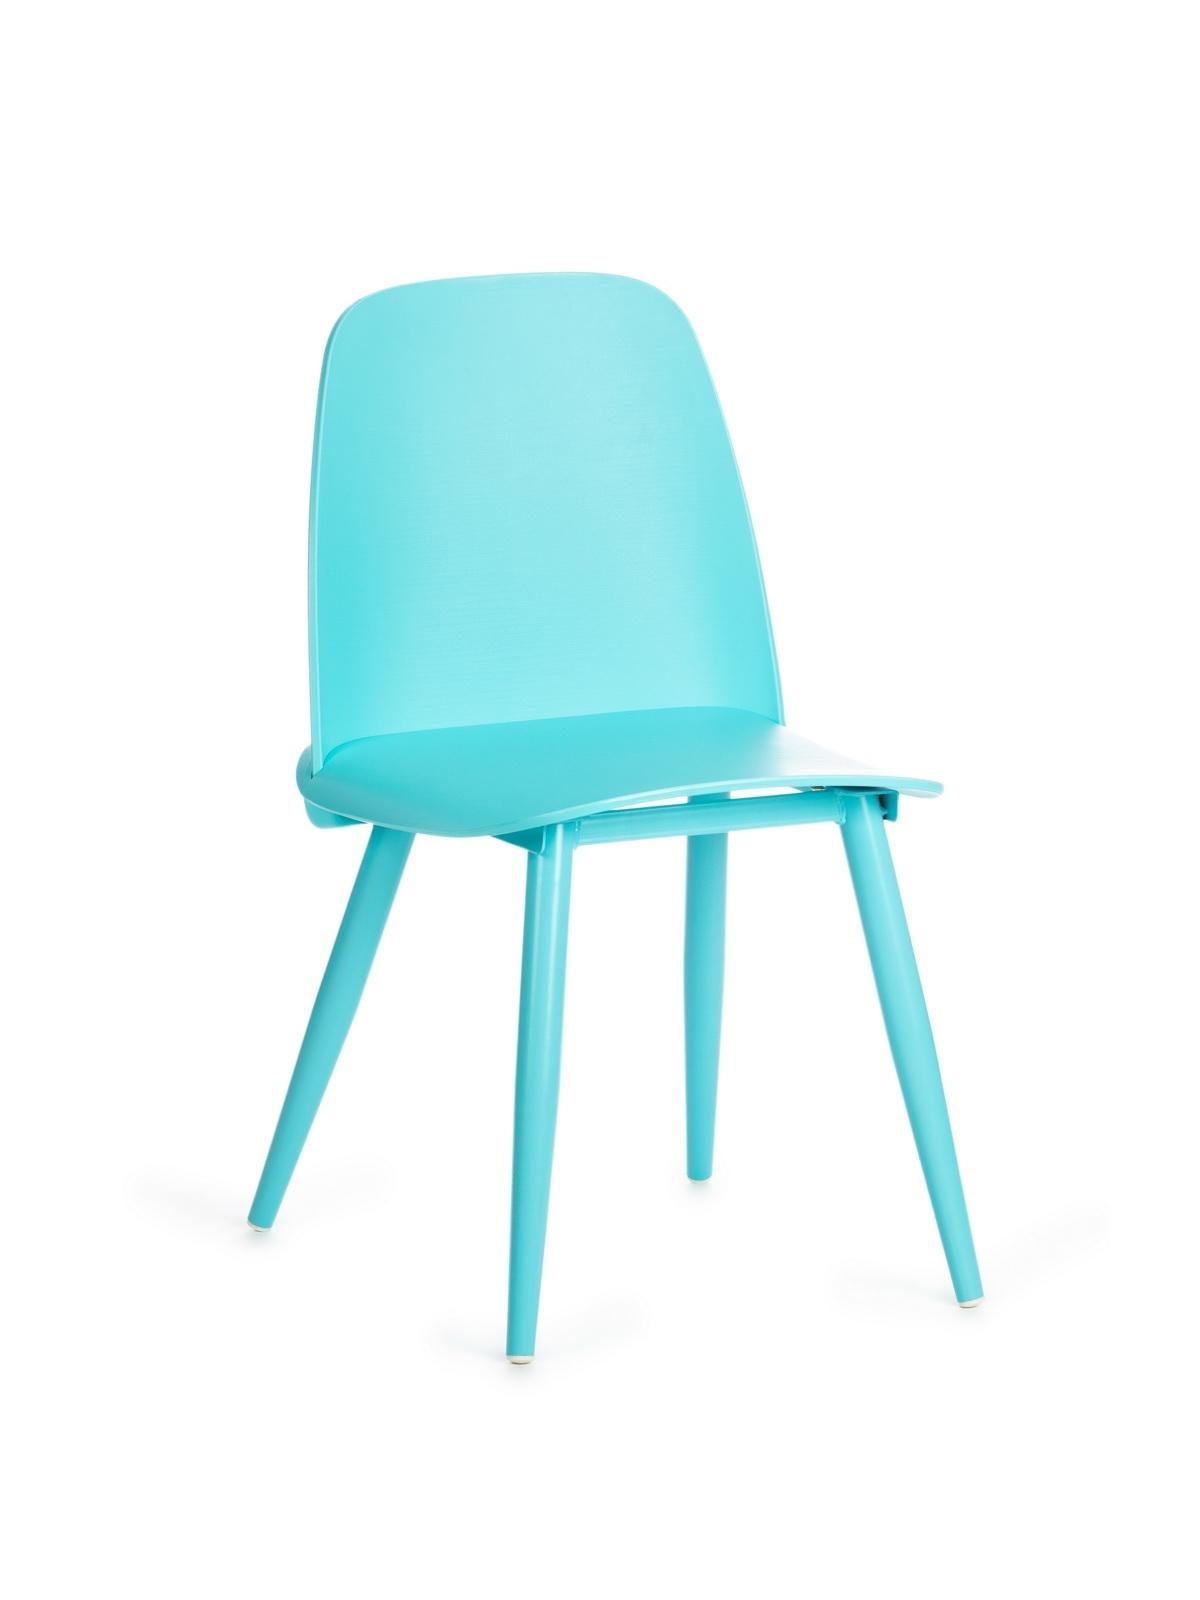 Scaun din plastic, cu picioare metalice Sting Blue, l50xA46xH80cm poza